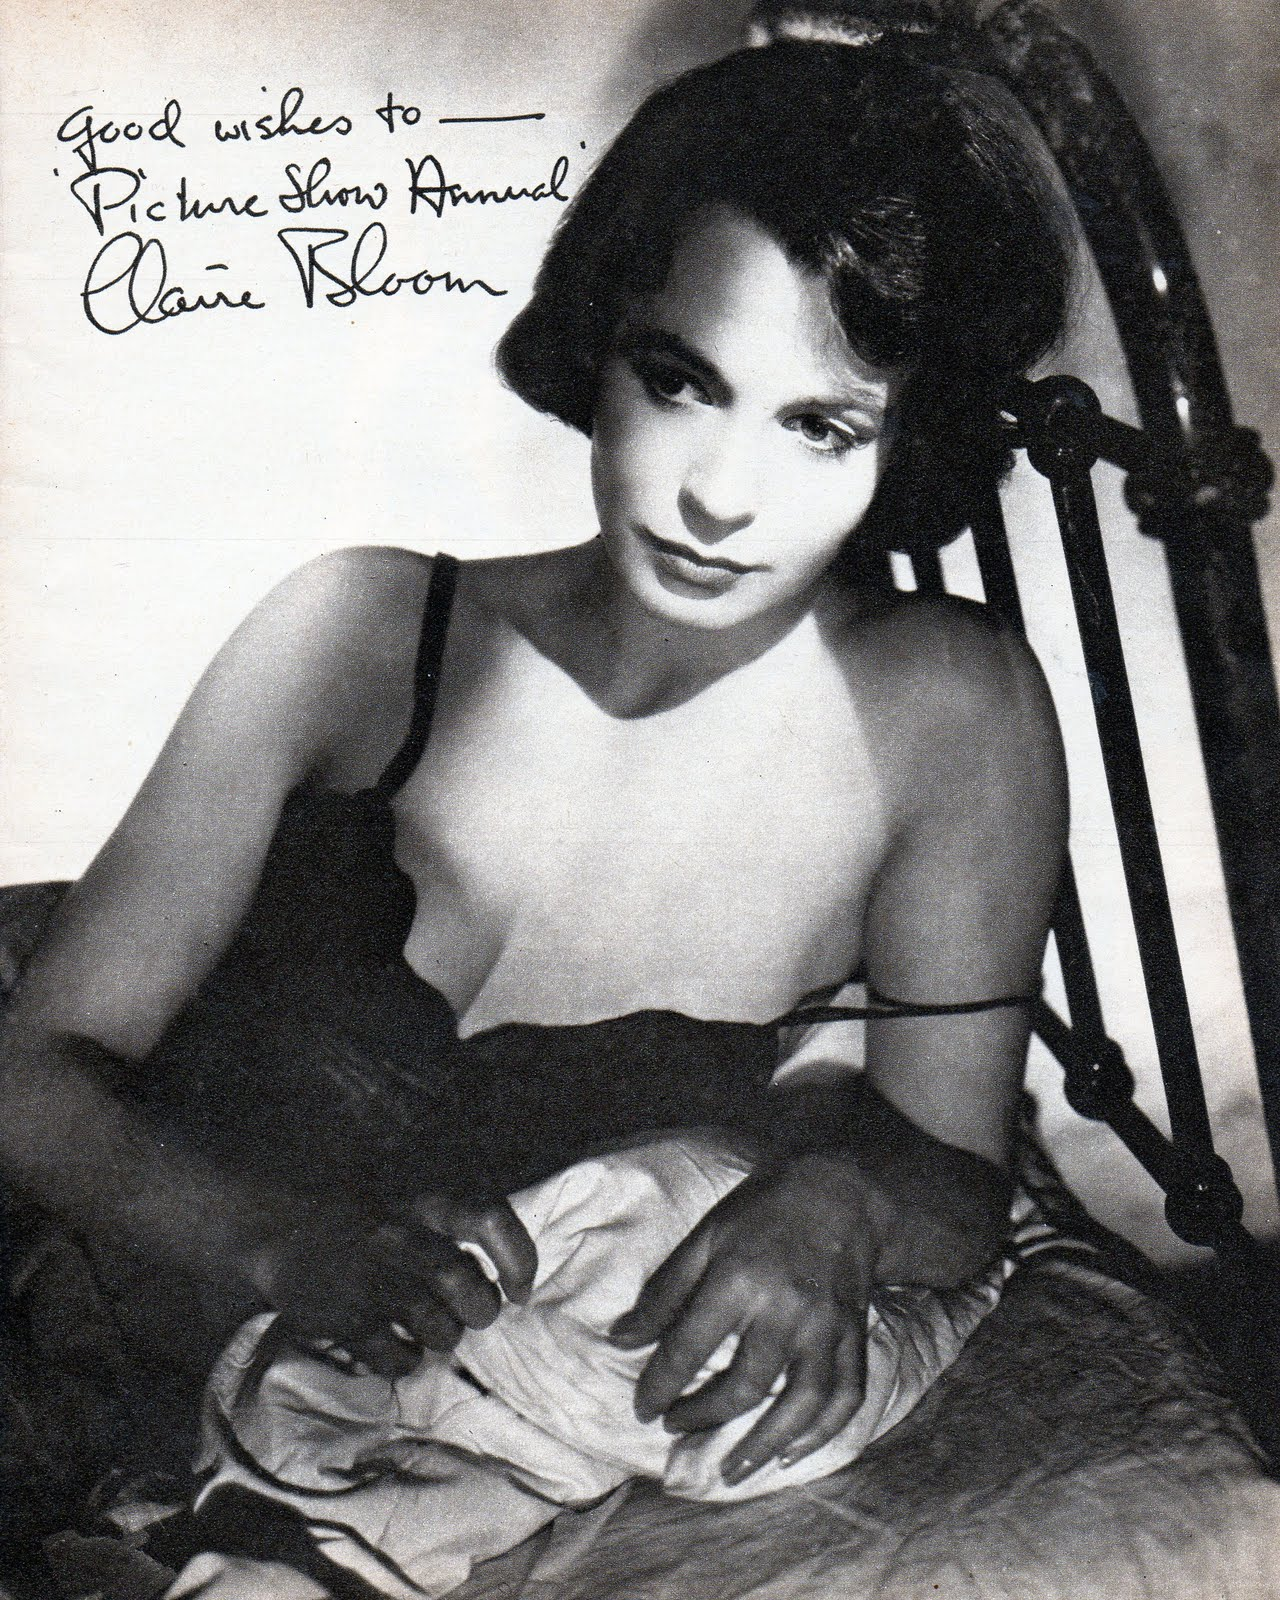 Communication on this topic: Rita La Roy, emma-hiddleston/